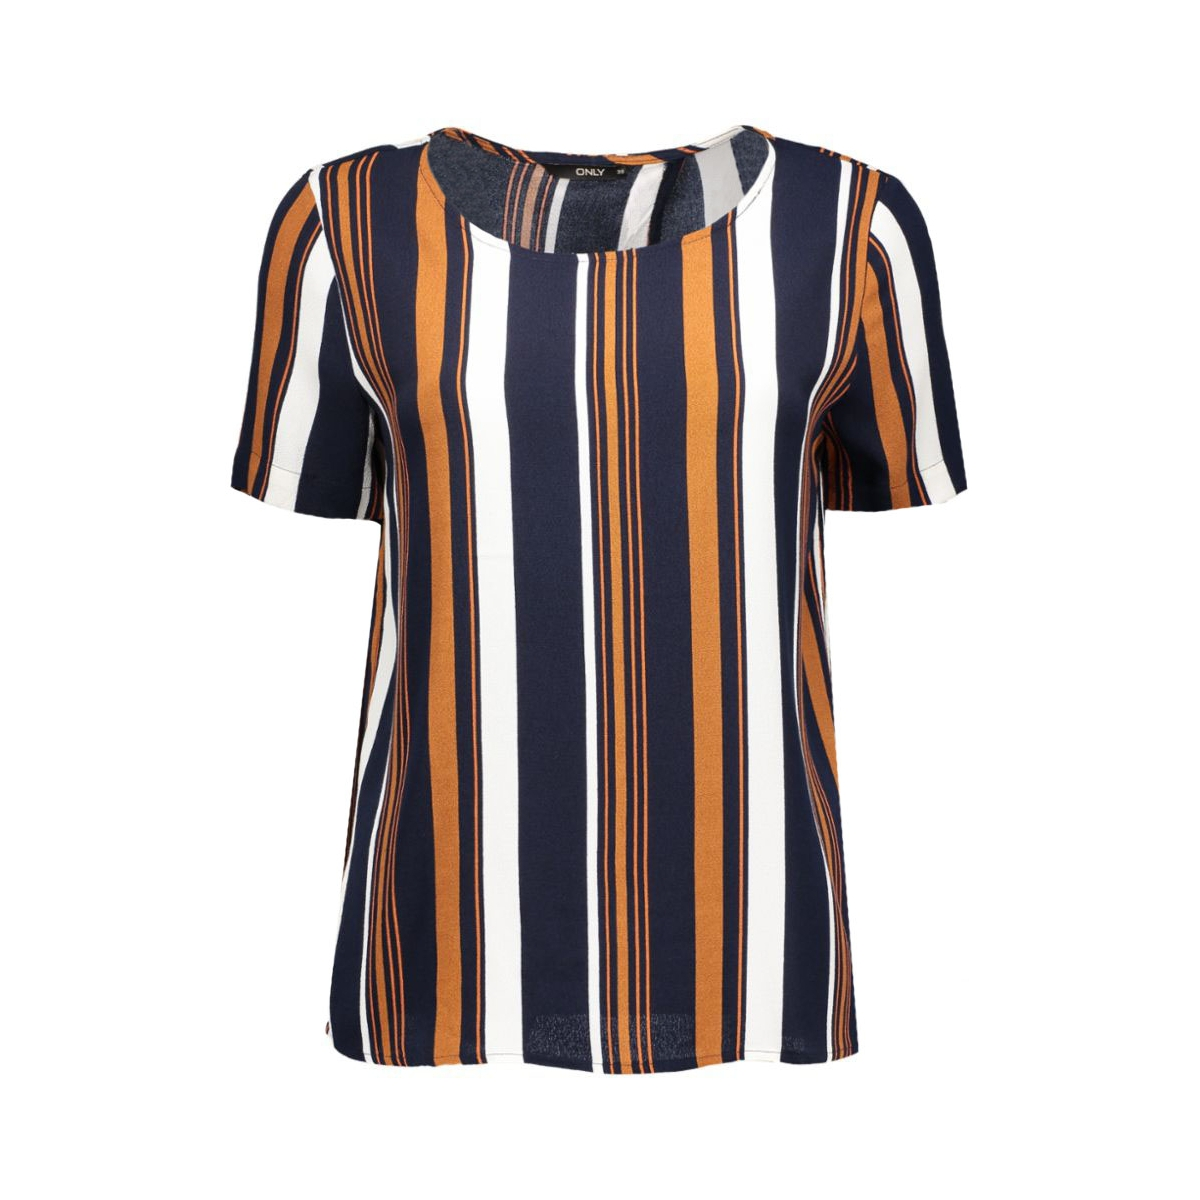 onlstrix cupid stripe s/s top wvn 15122991 only t-shirt night sky/worker